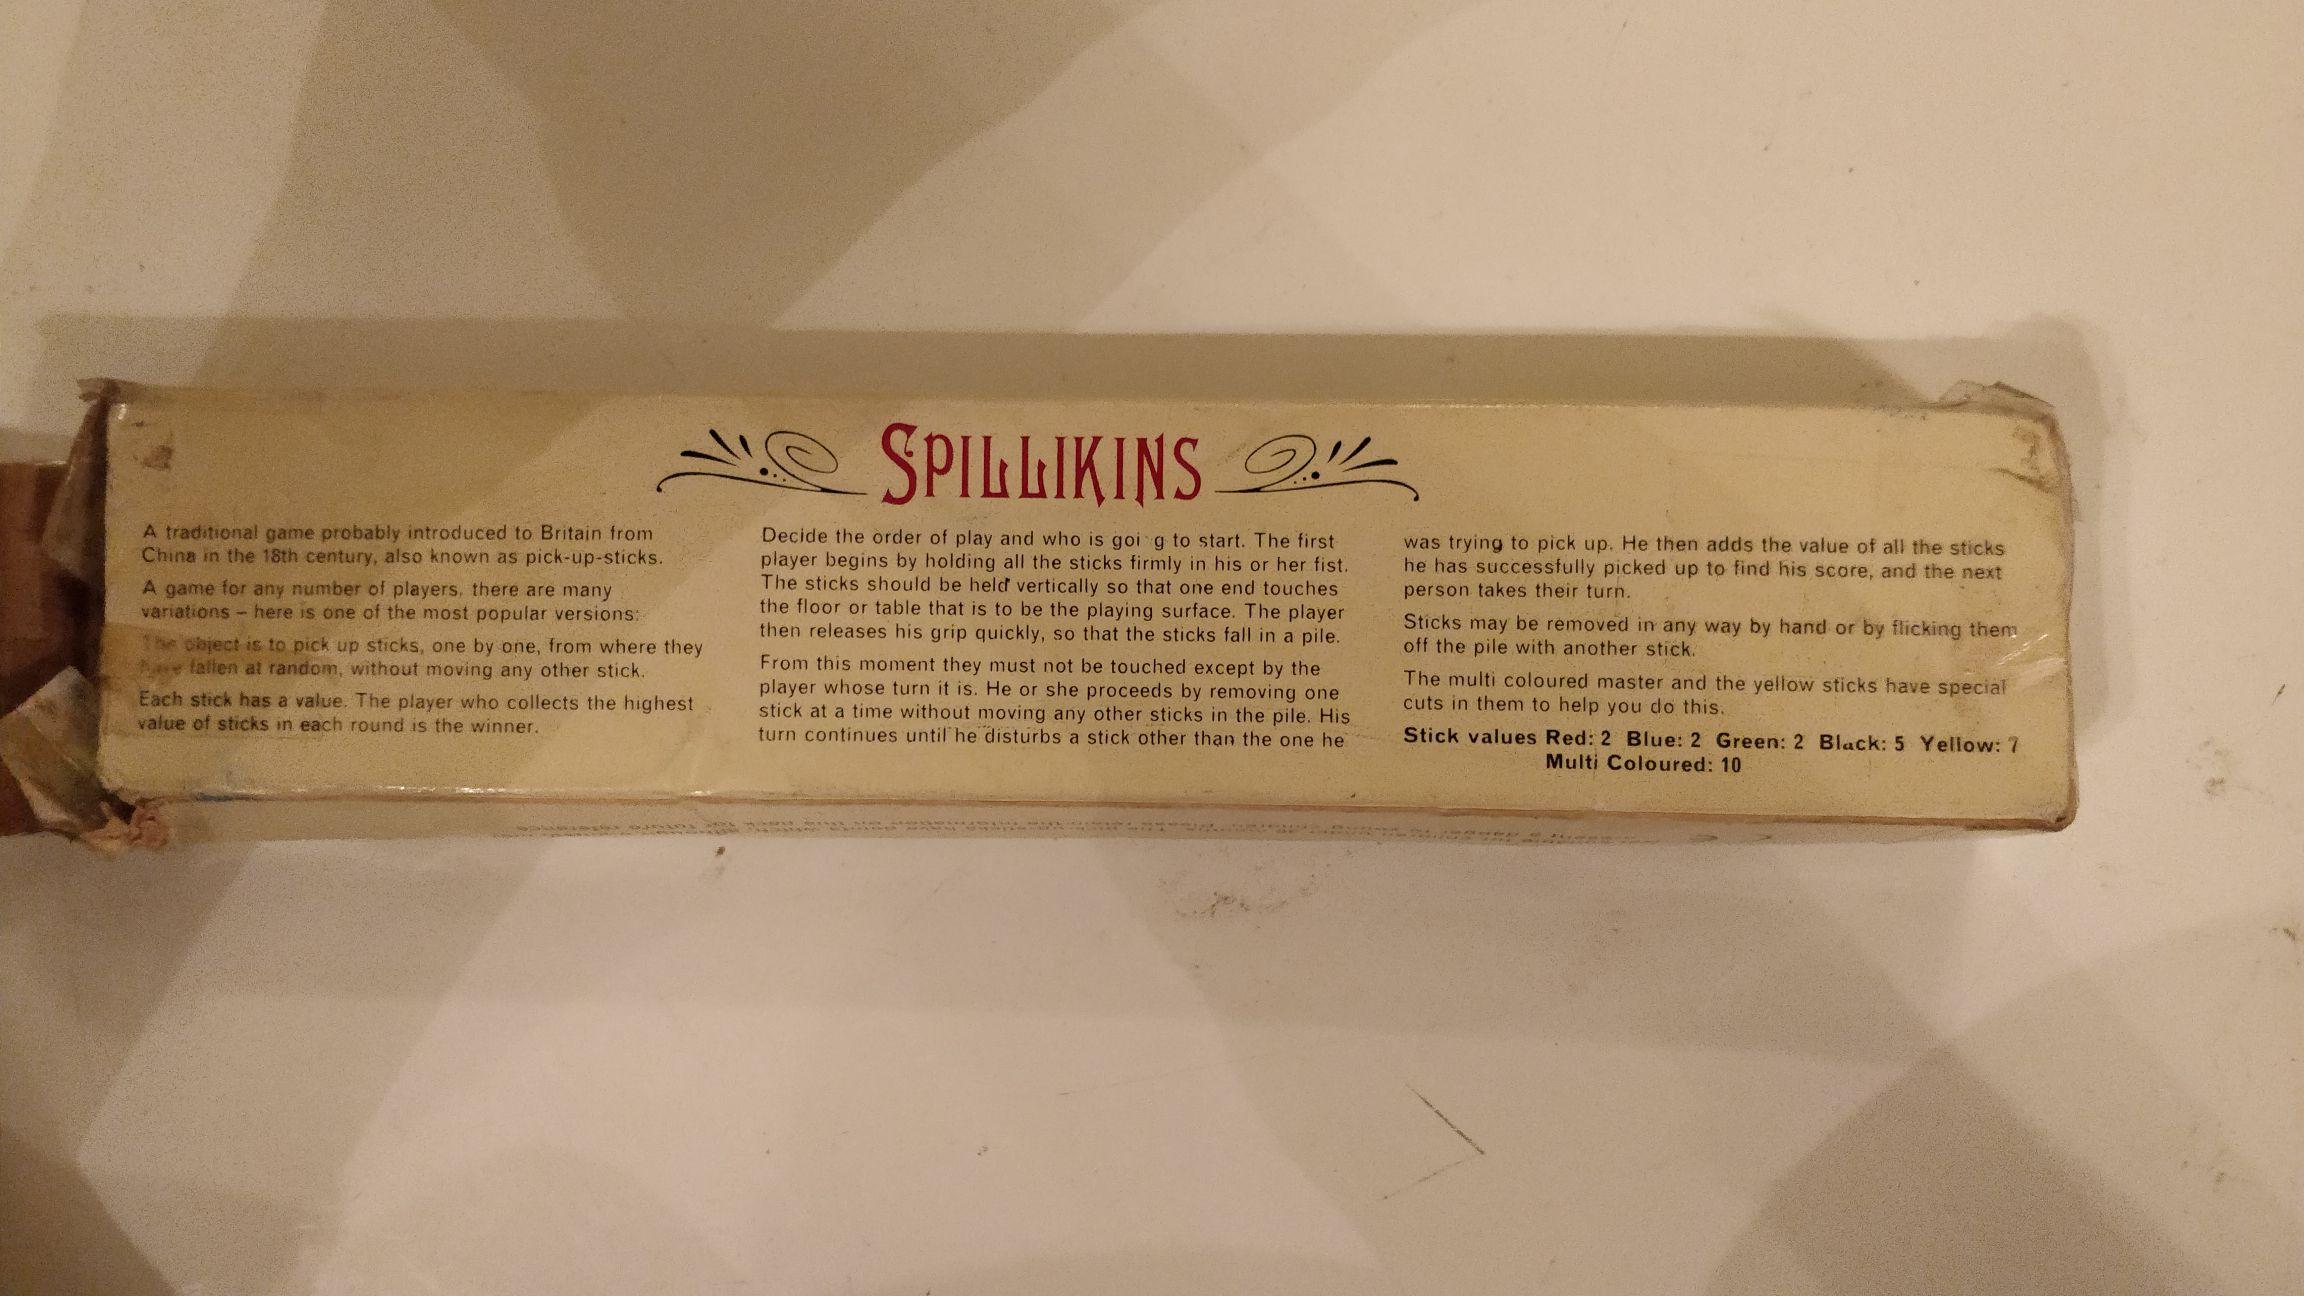 Spillikins Board Game - Past times (Building) back image (back cover, second image)